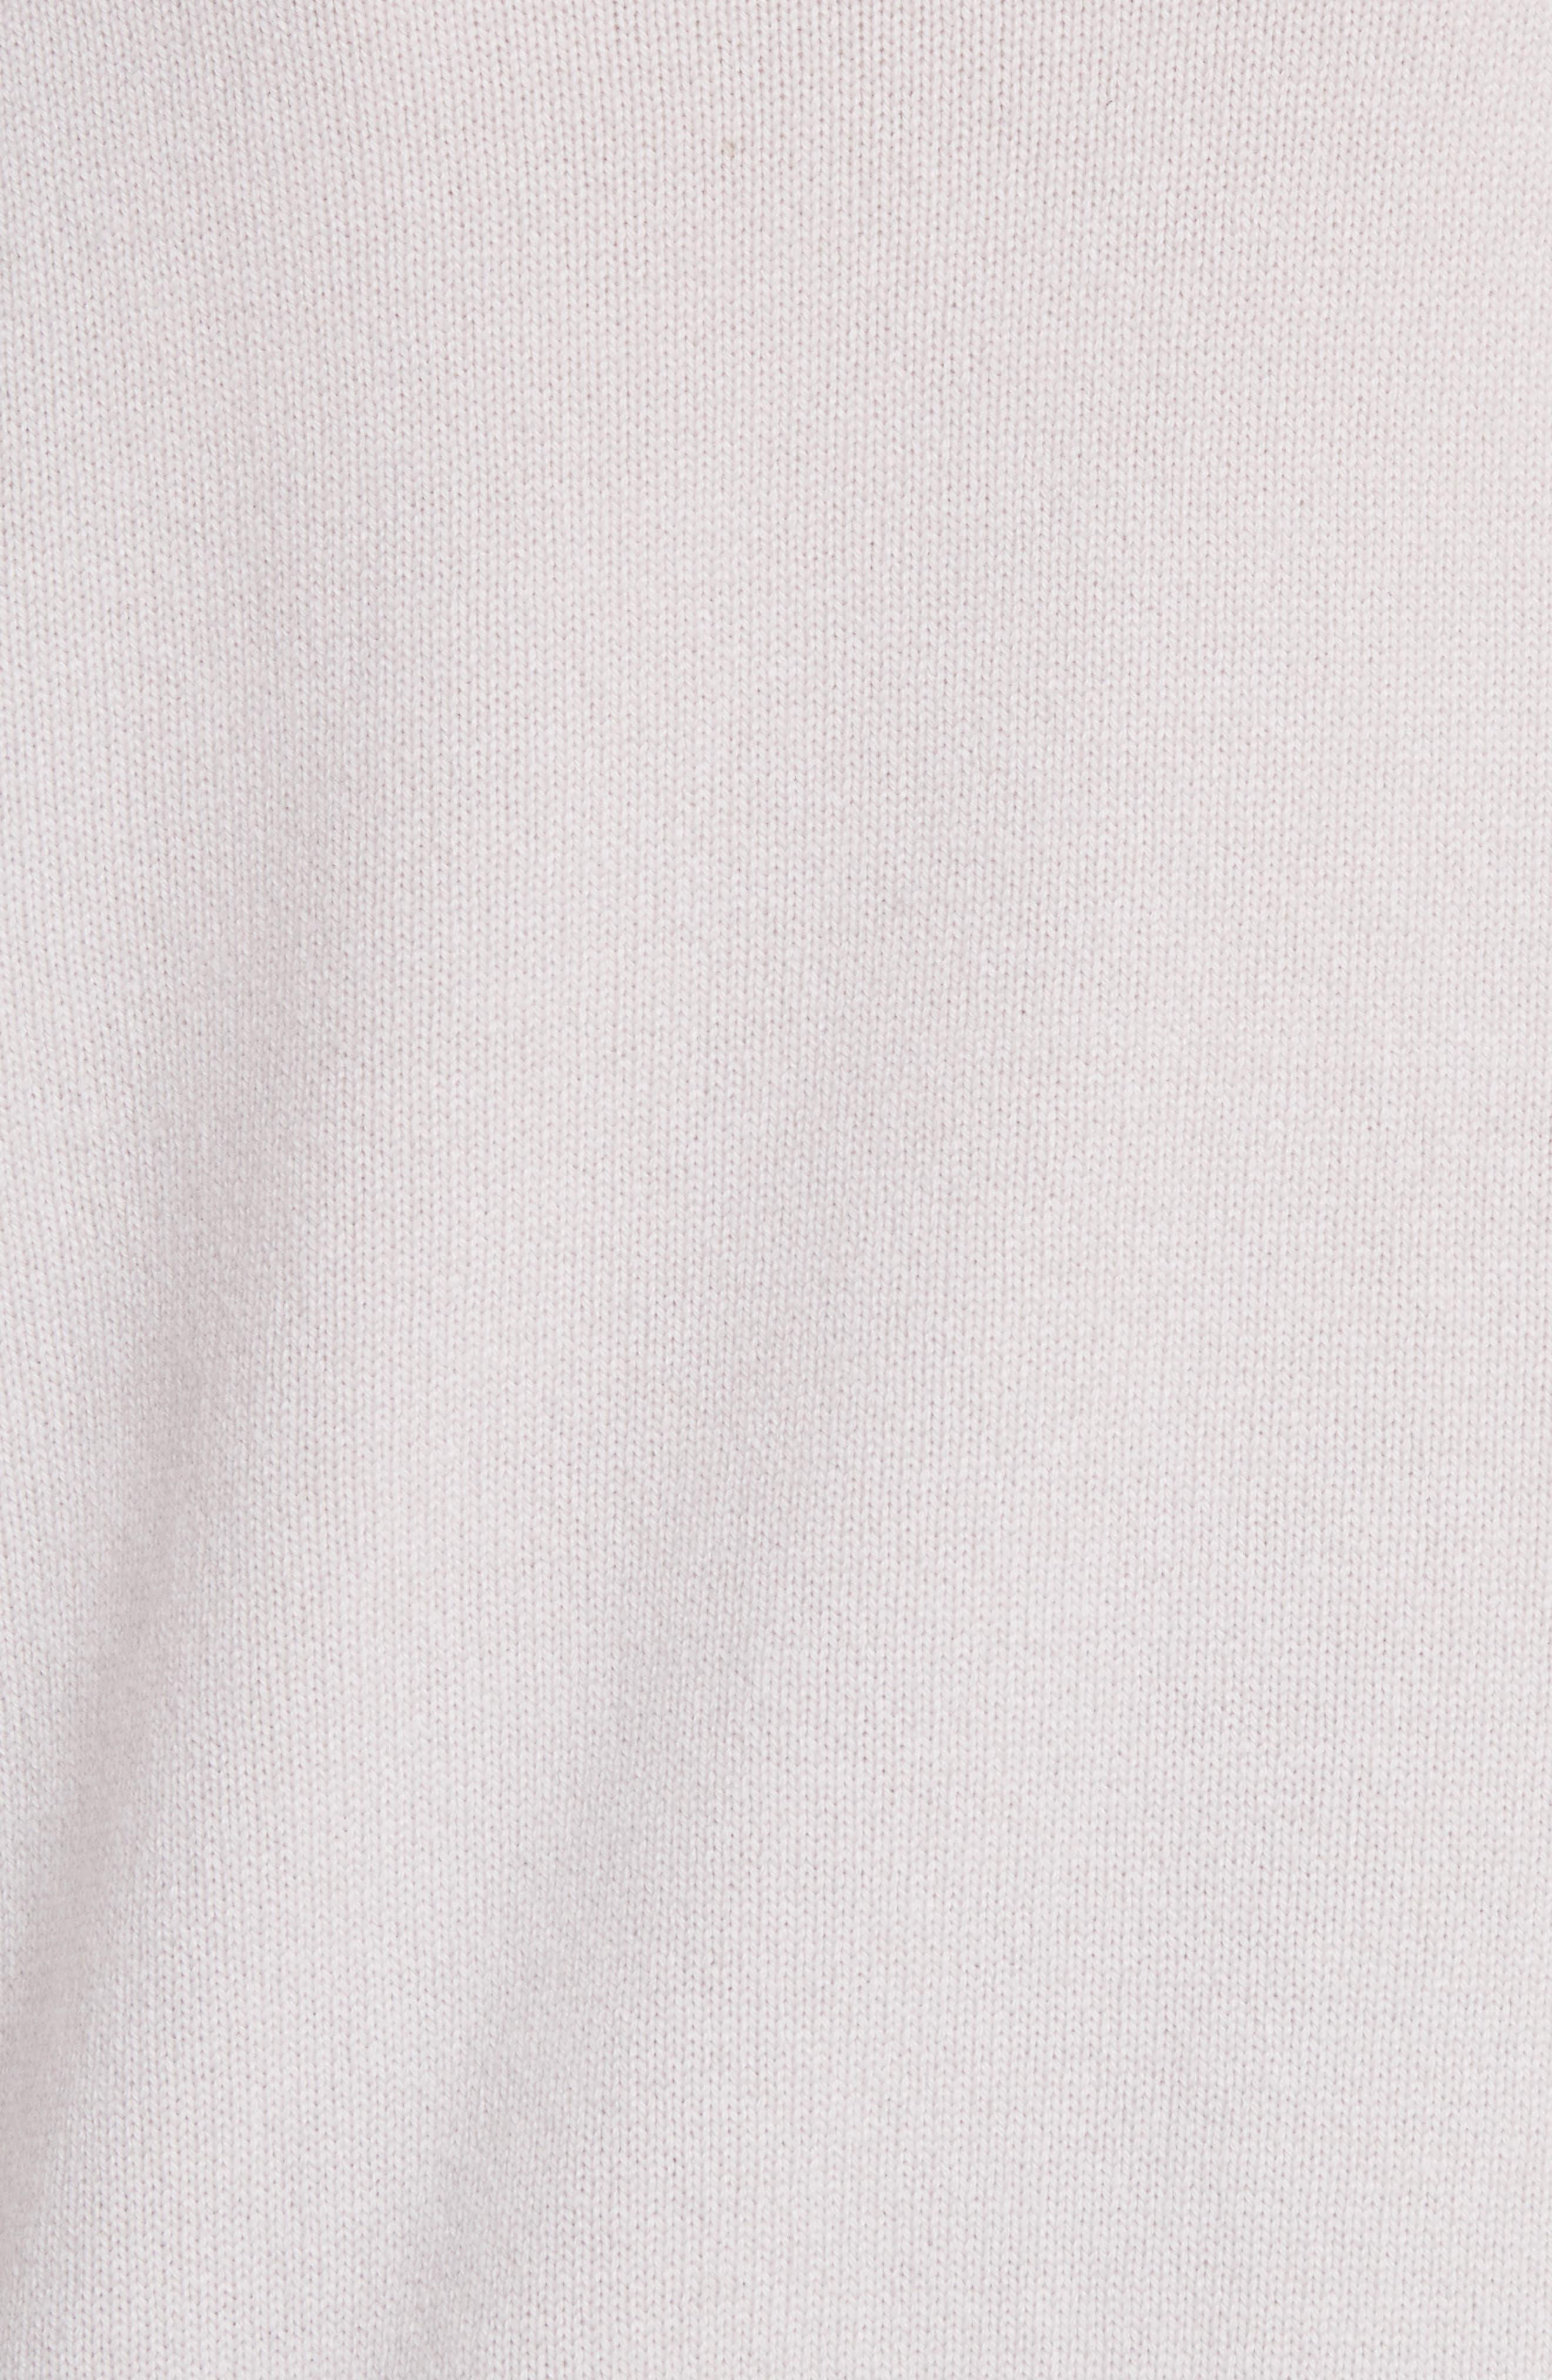 Balloon Sleeve Cashmere Turtleneck Sweater,                             Alternate thumbnail 5, color,                             020